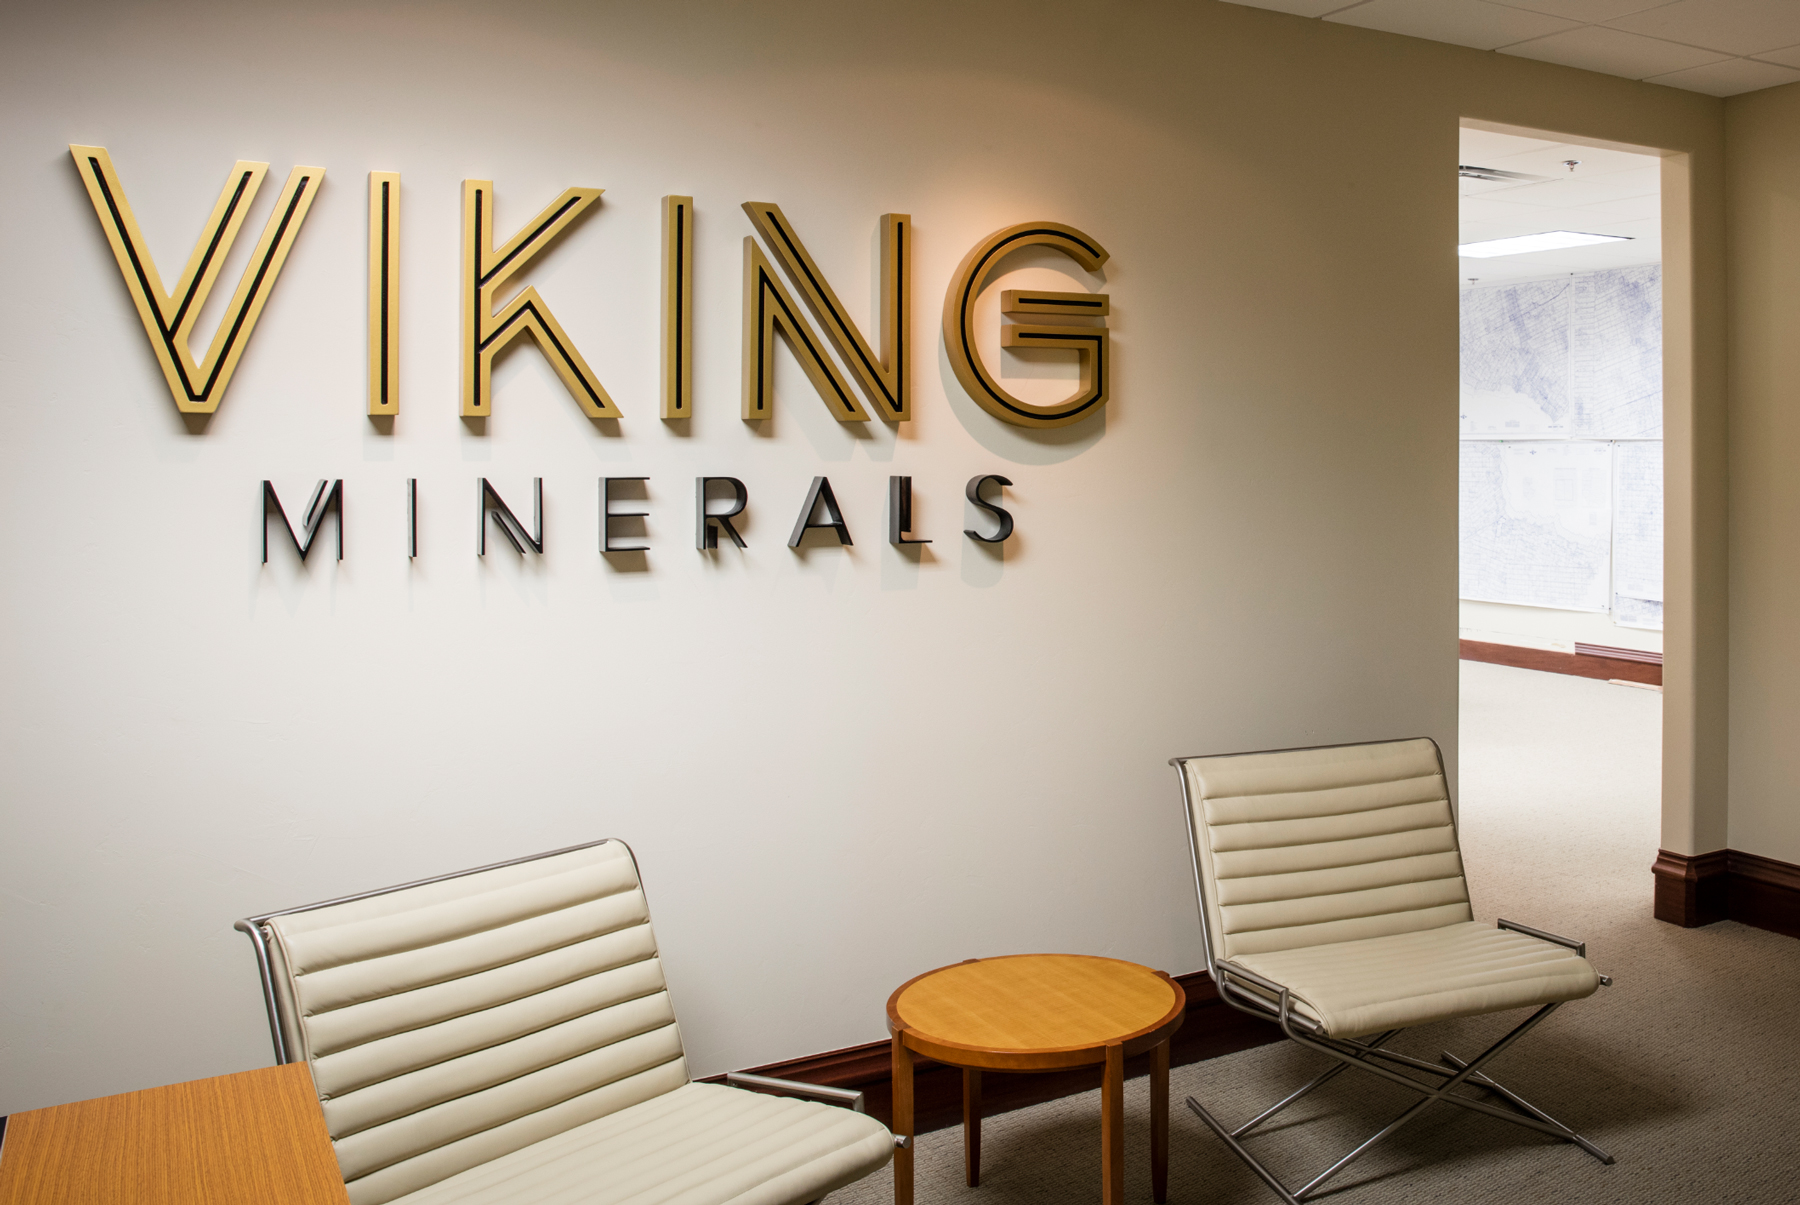 Viking-OfficeSignage.jpg